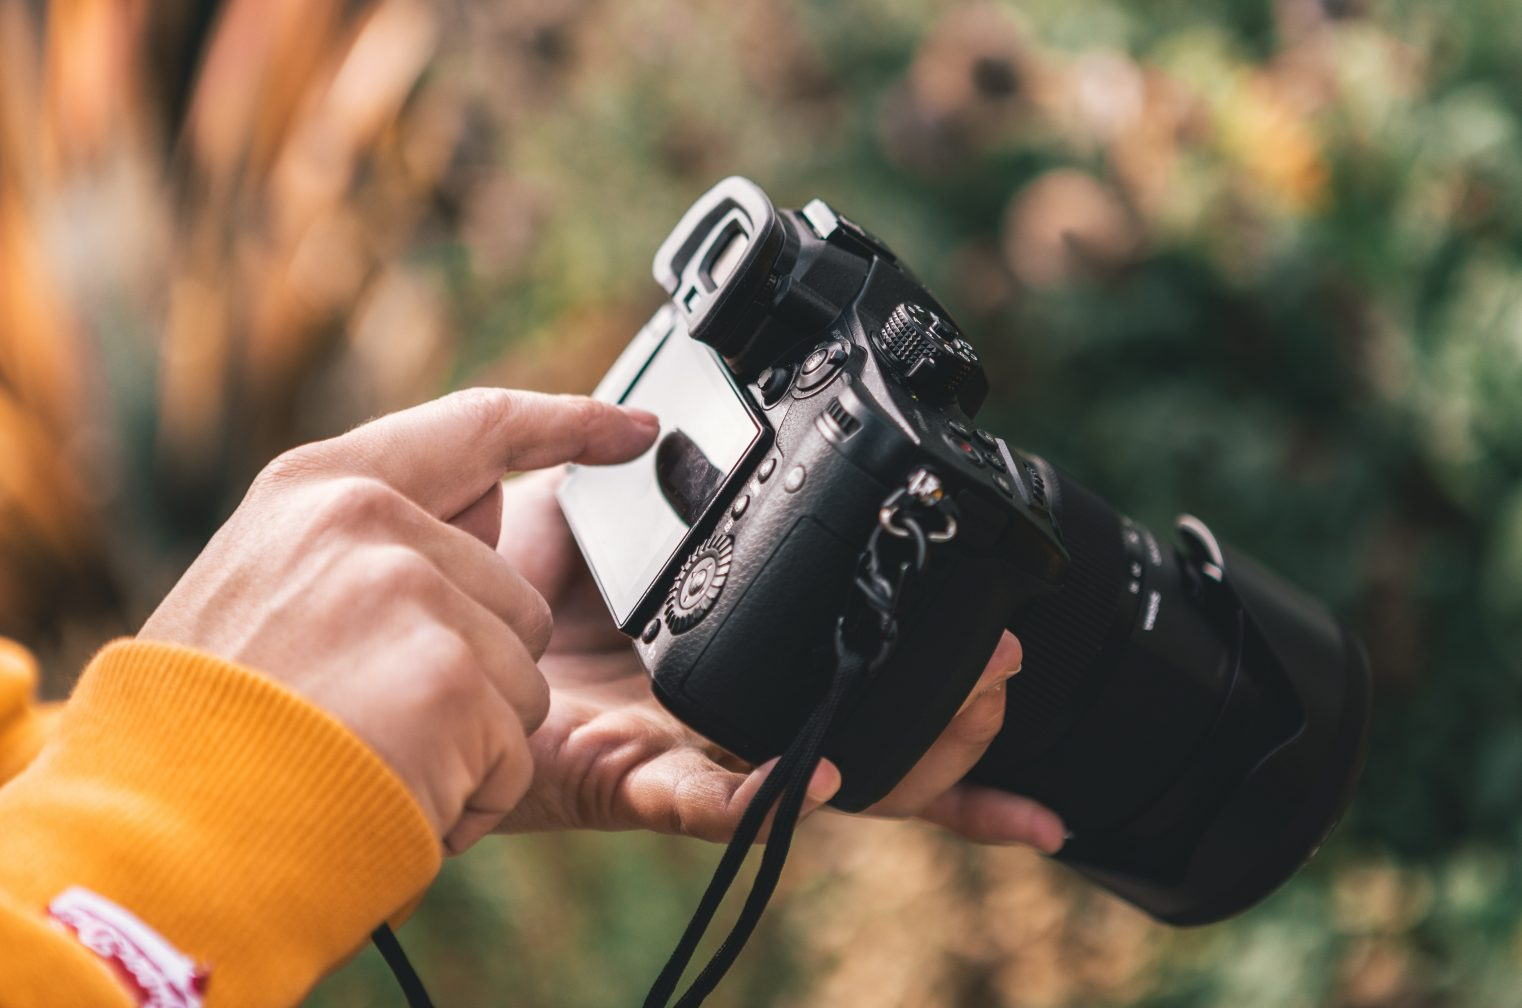 Vlogに最適なカメラ6選!海外はこう見た